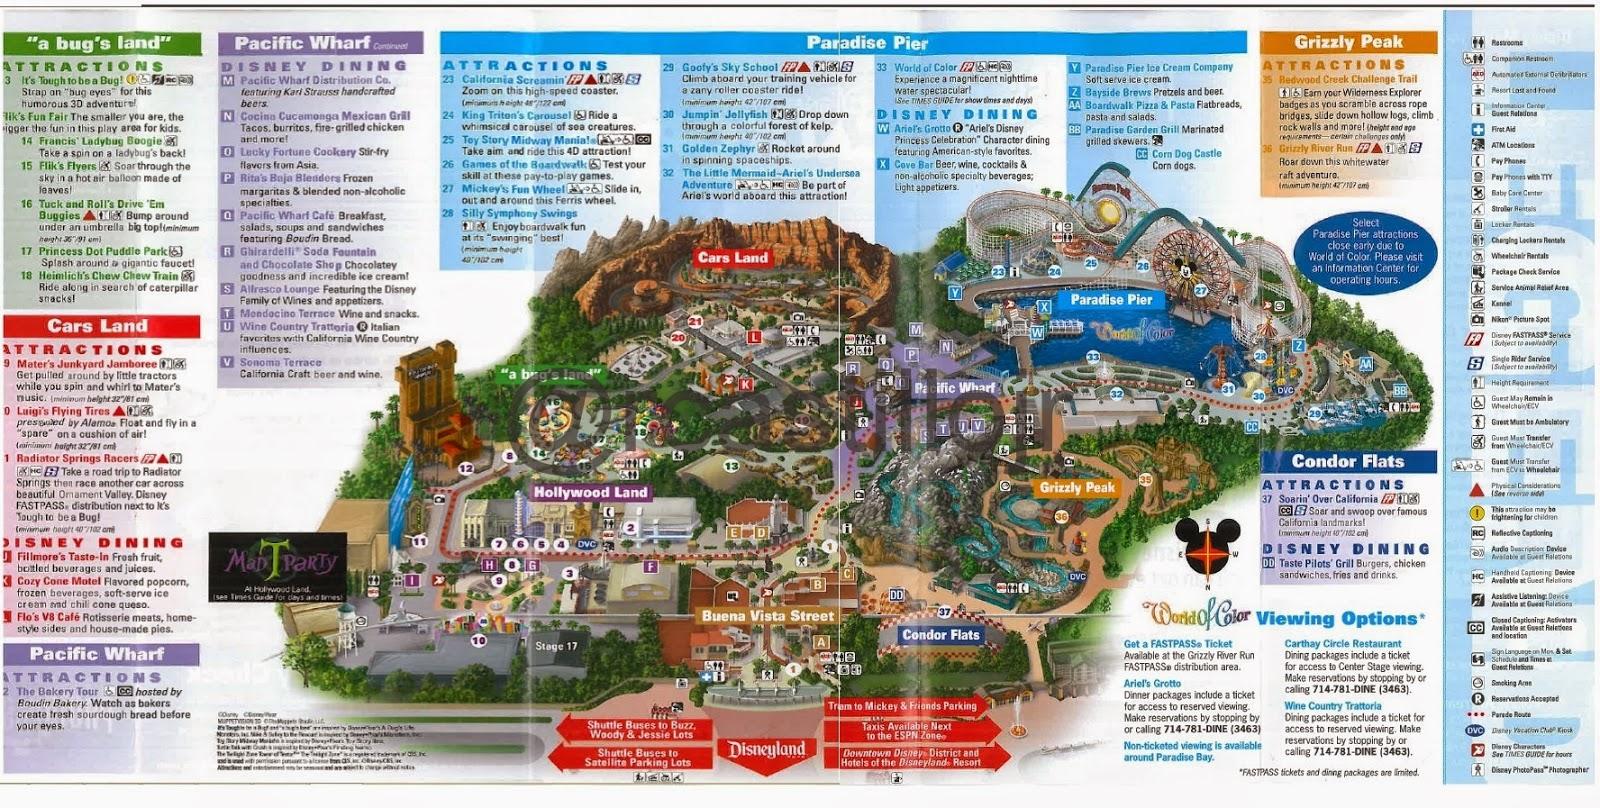 Disneyland 2015 Map | Search Results | Calendar 2015